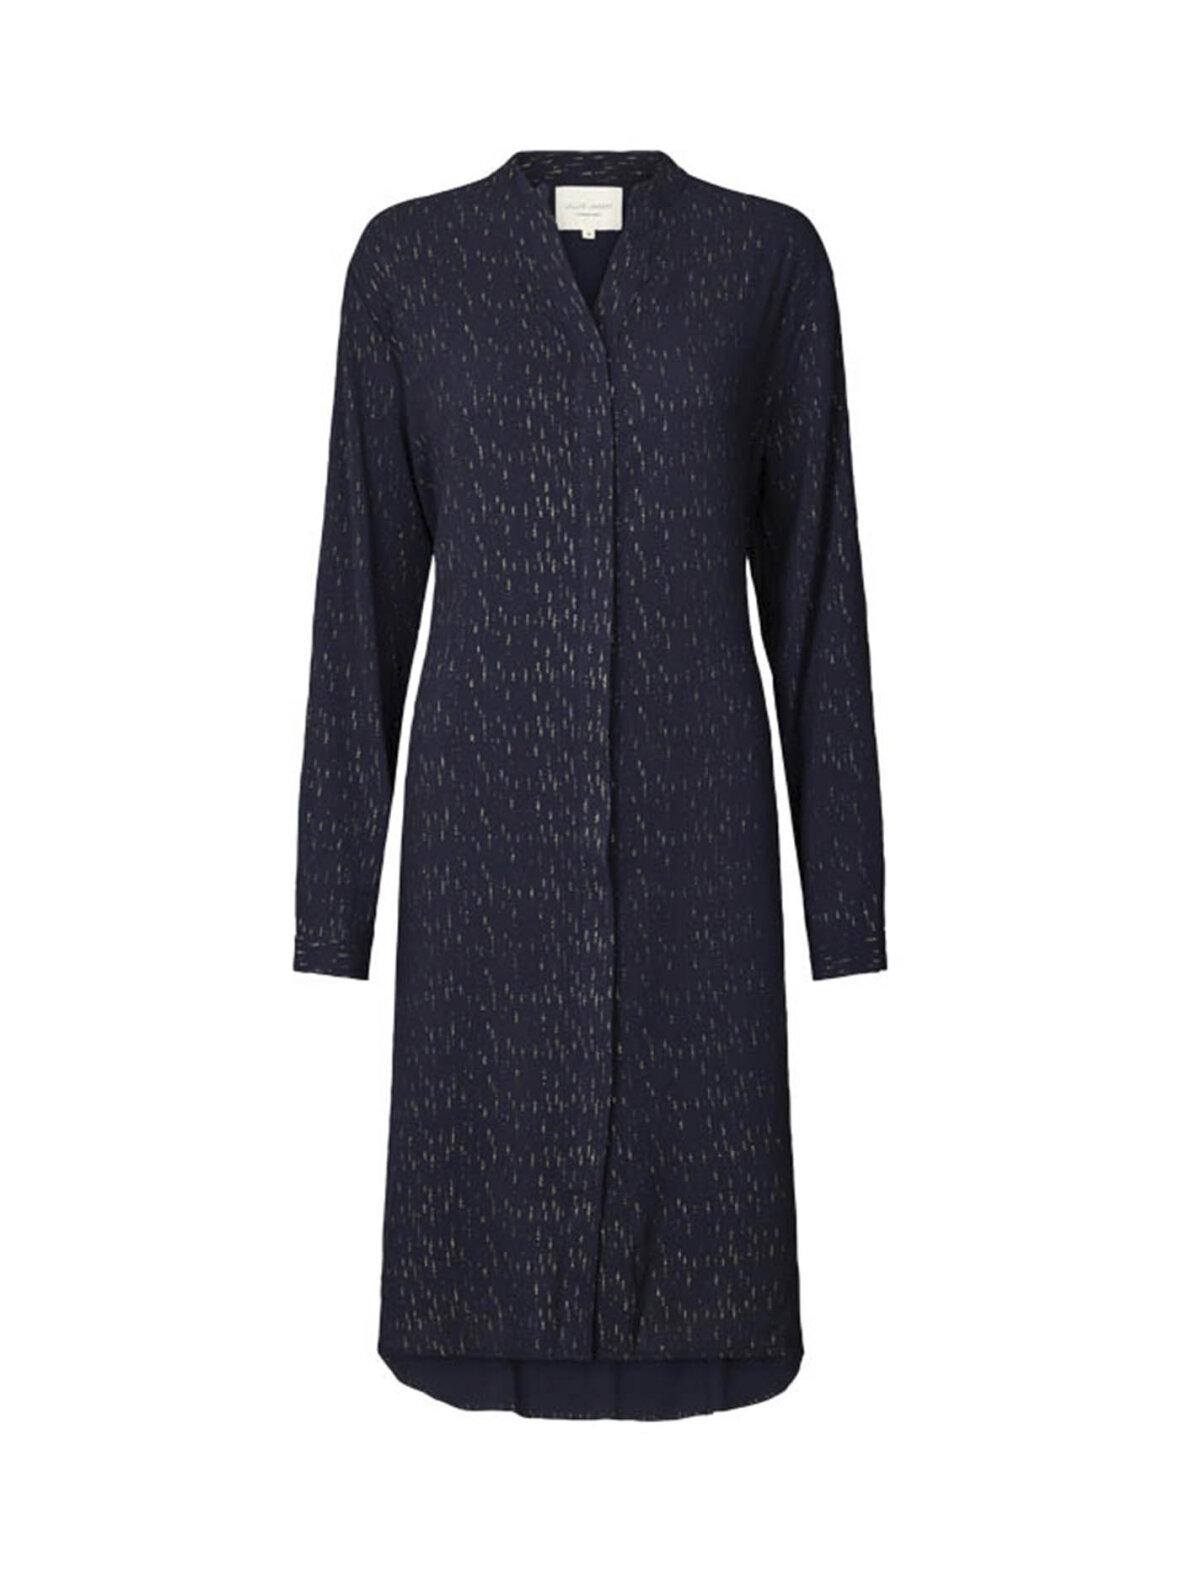 a465a24b Enula9 - Gravid kjoler - Lollys Laundry - French dress - navy